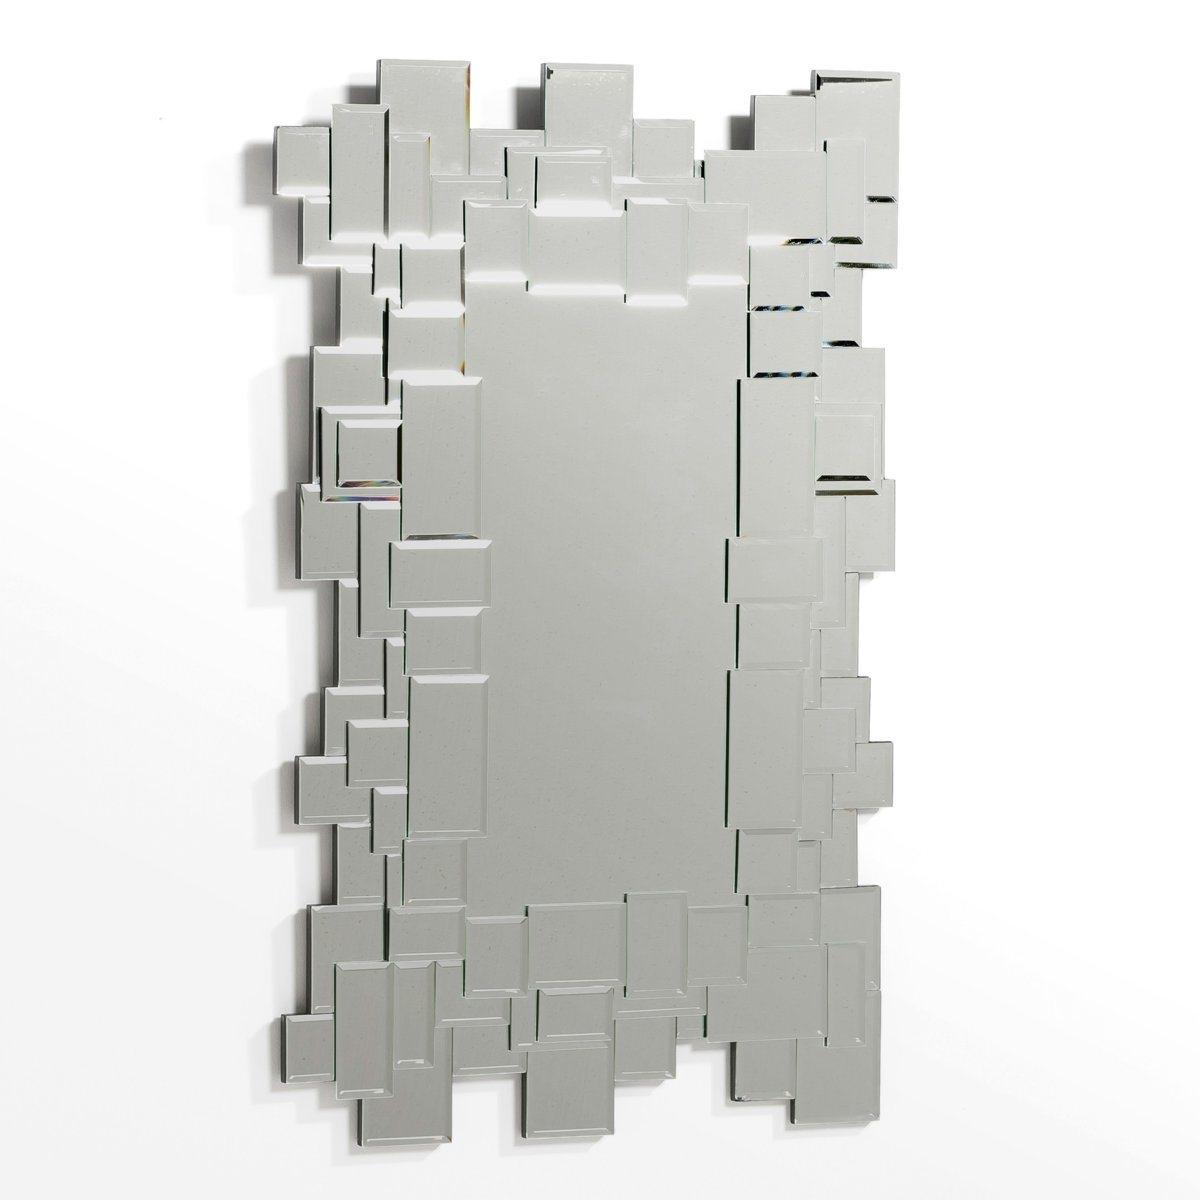 Зеркало Д50 x В80 см, Hamlet<br><br>Цвет: безцветный